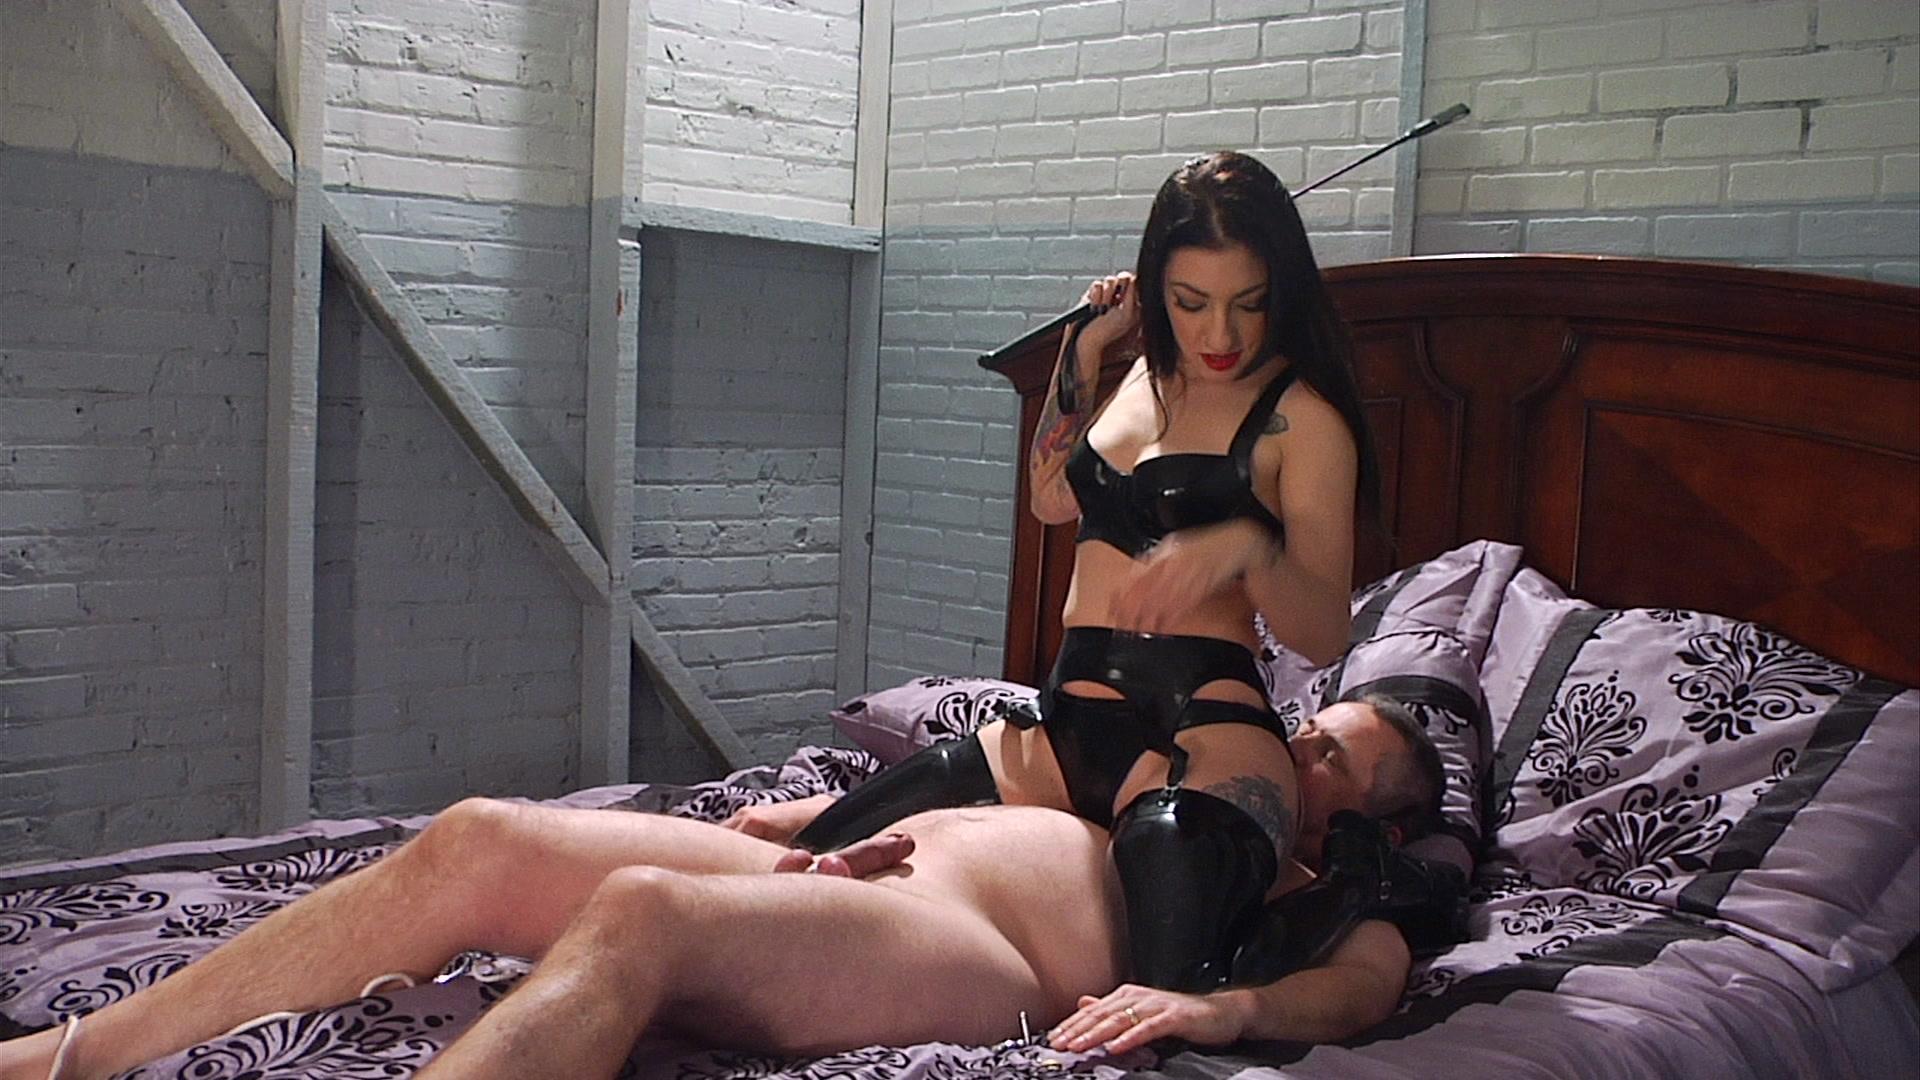 She sexy Bdsm video rental stunning